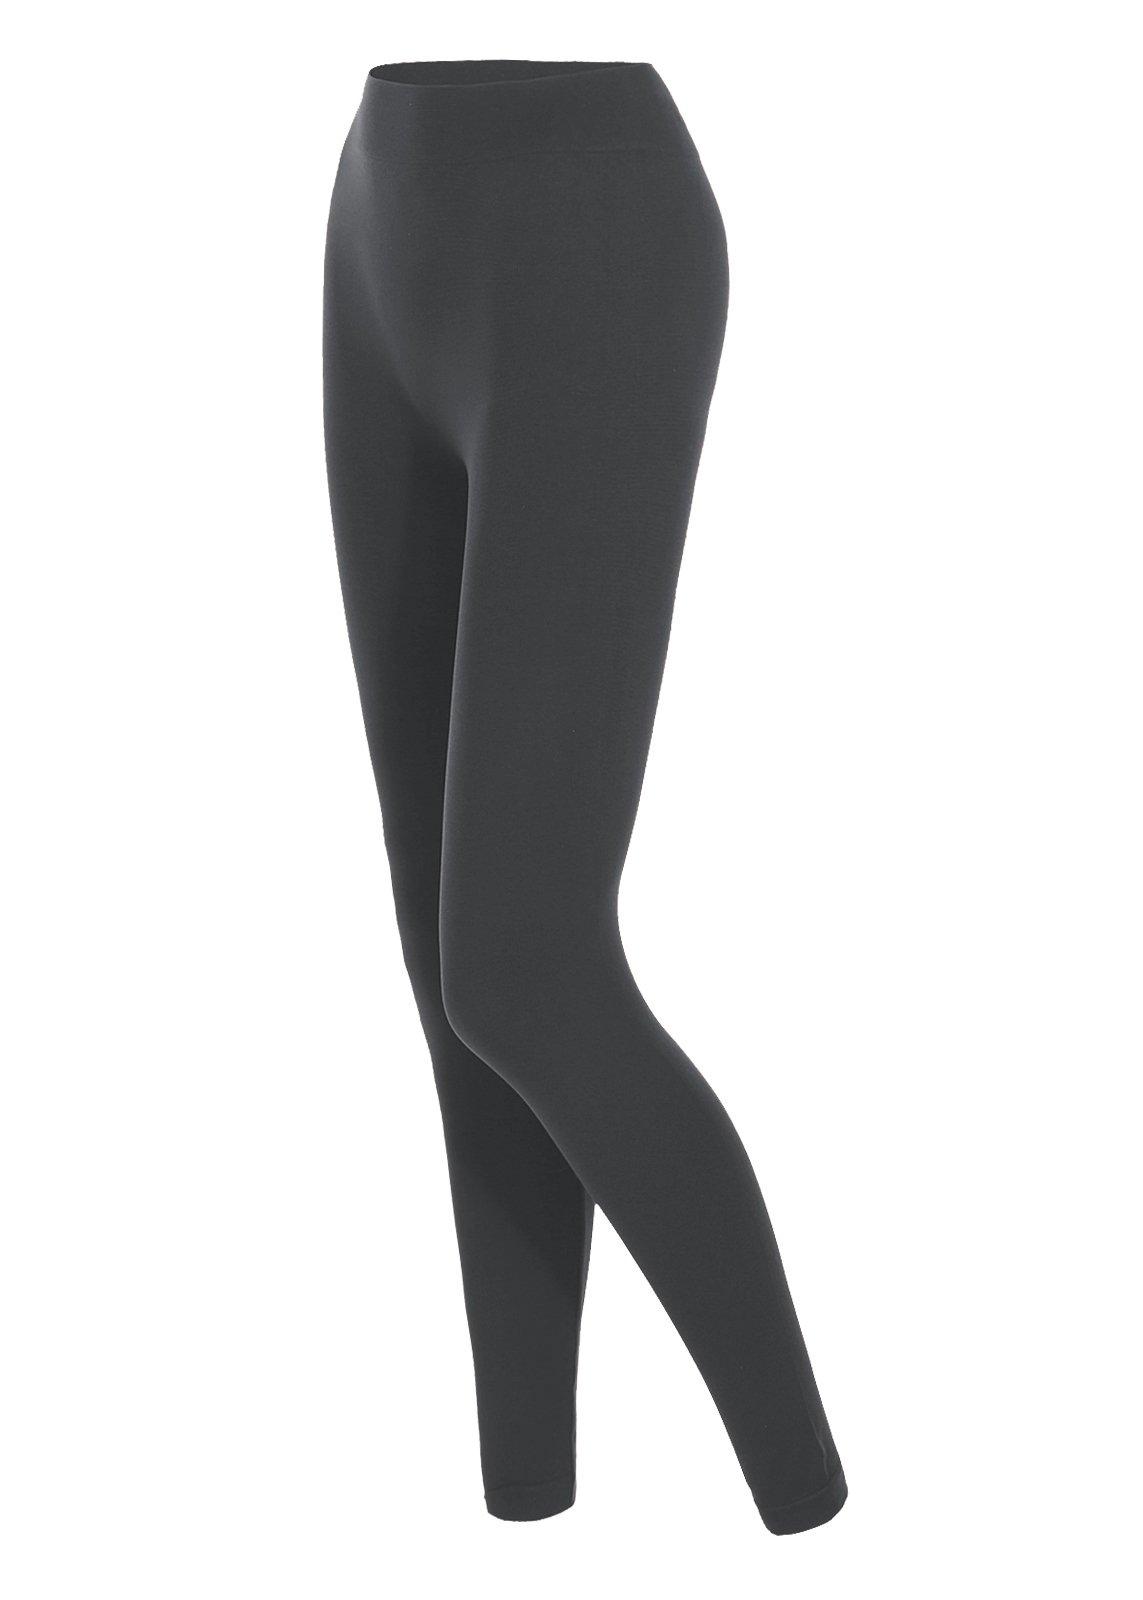 Luna Flower Women's High Waist Legging Premium Cotton Skinny Fit Tights ASH_Grey LXL(GPTW040)